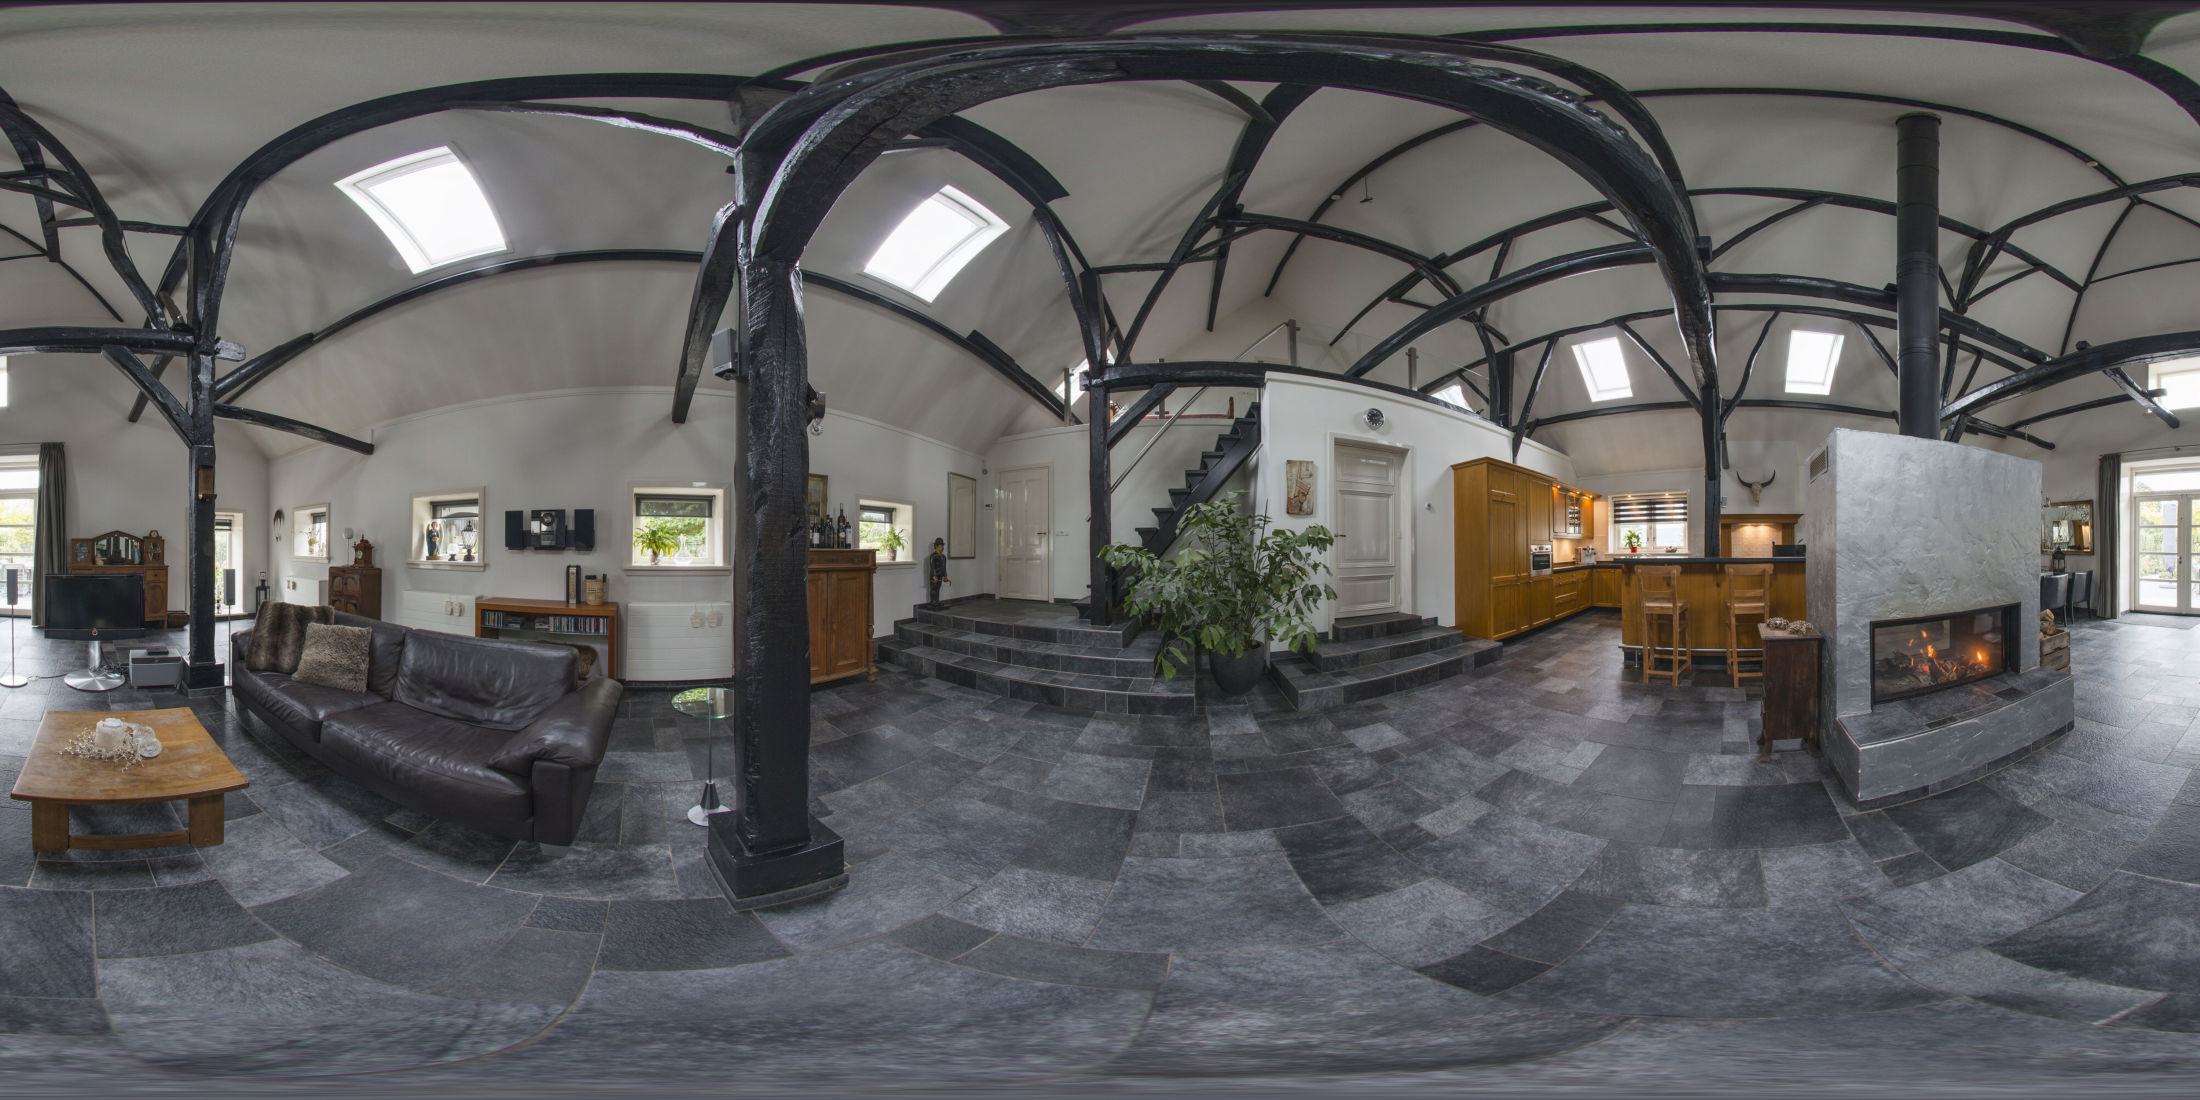 Martin, Google Street View - 360, Happix